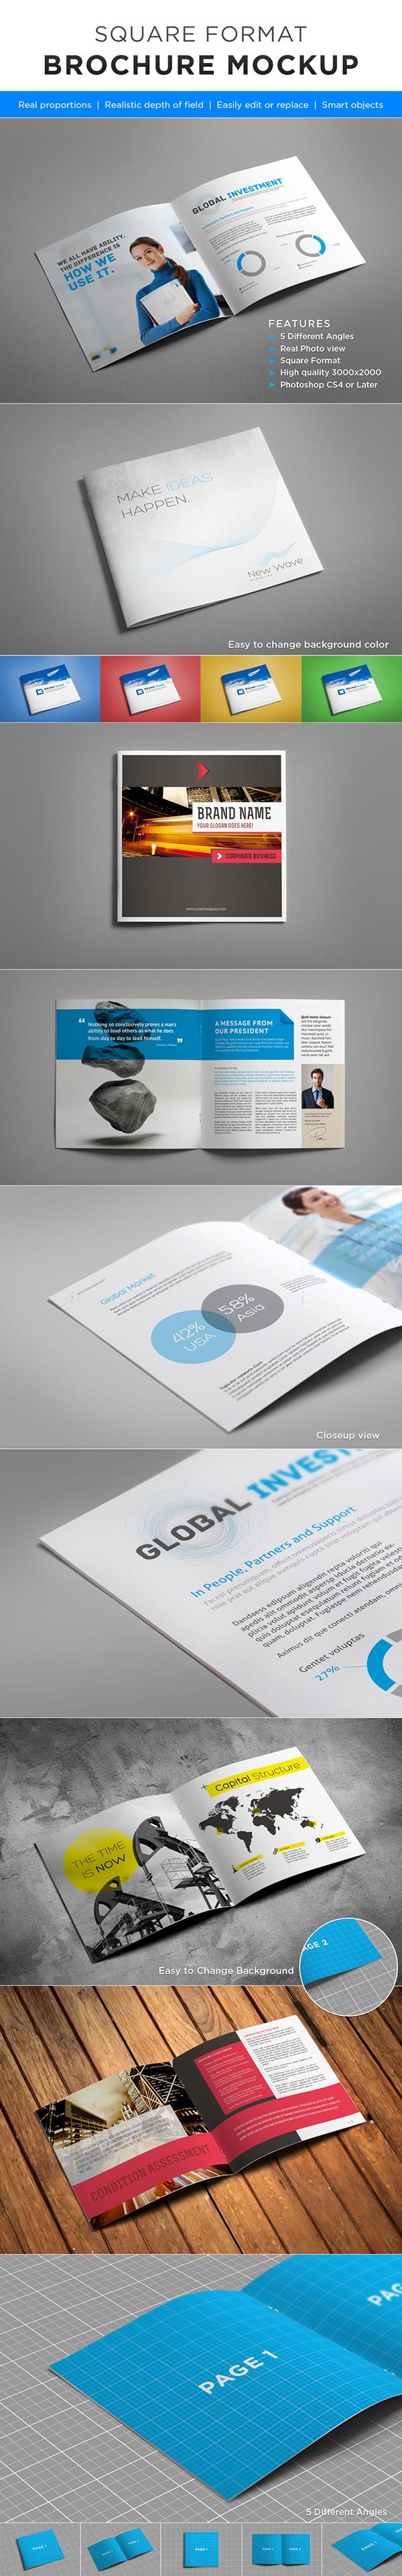 book Booklet brochure business corporate cover Customize elegant magazine Manuals mock up mock-up mock-ups preview Multipurpose